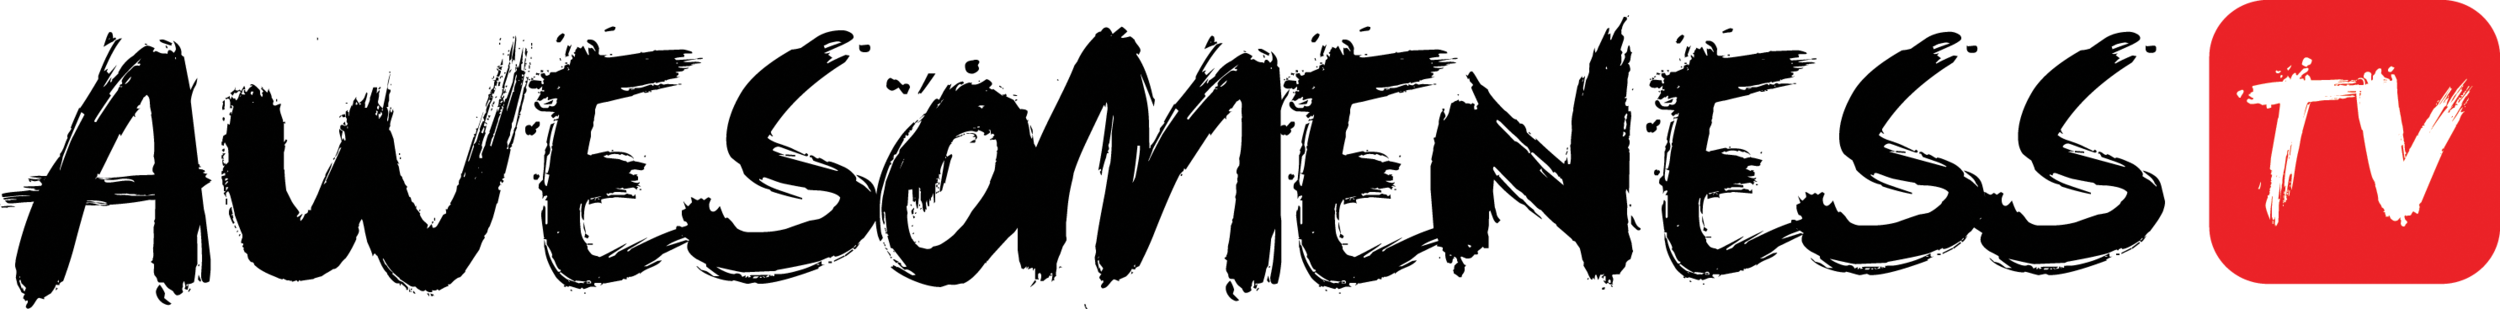 AwesomenessTV_Logo.png